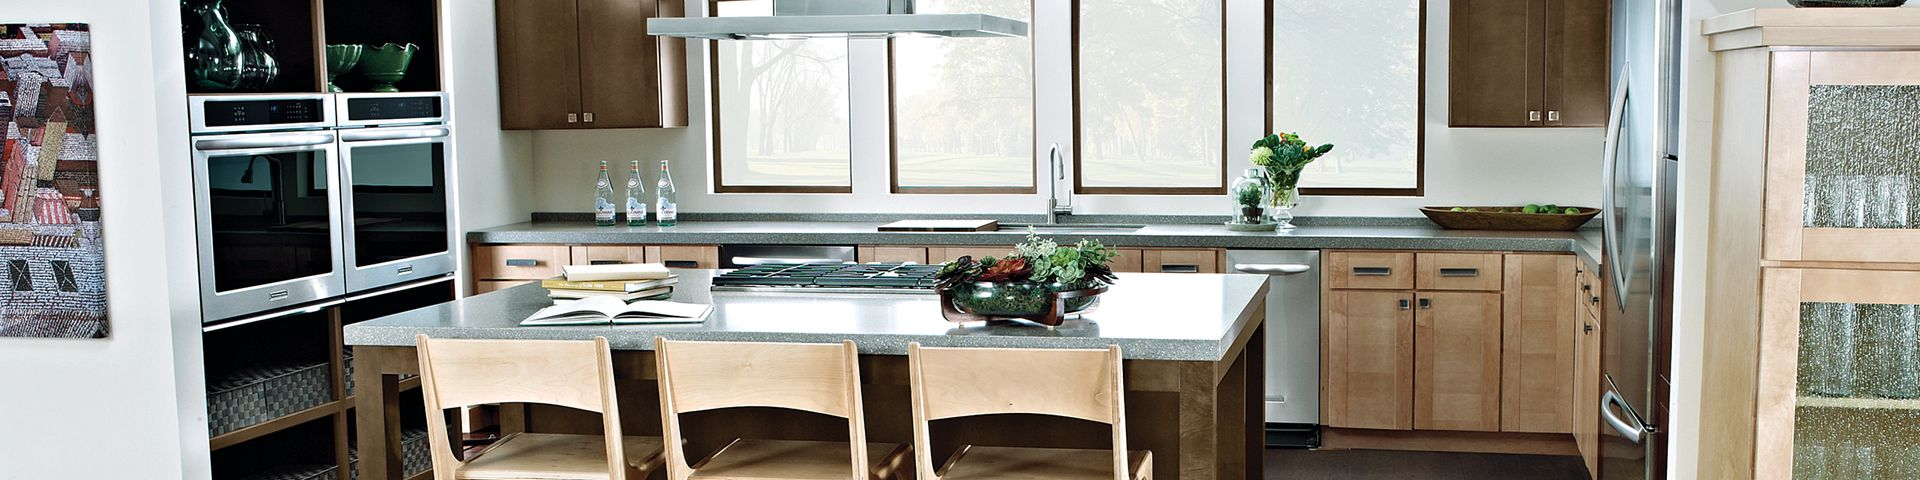 Hardwood-WaywardHickory-403TB-07073-Pumice-Kitchen-2020